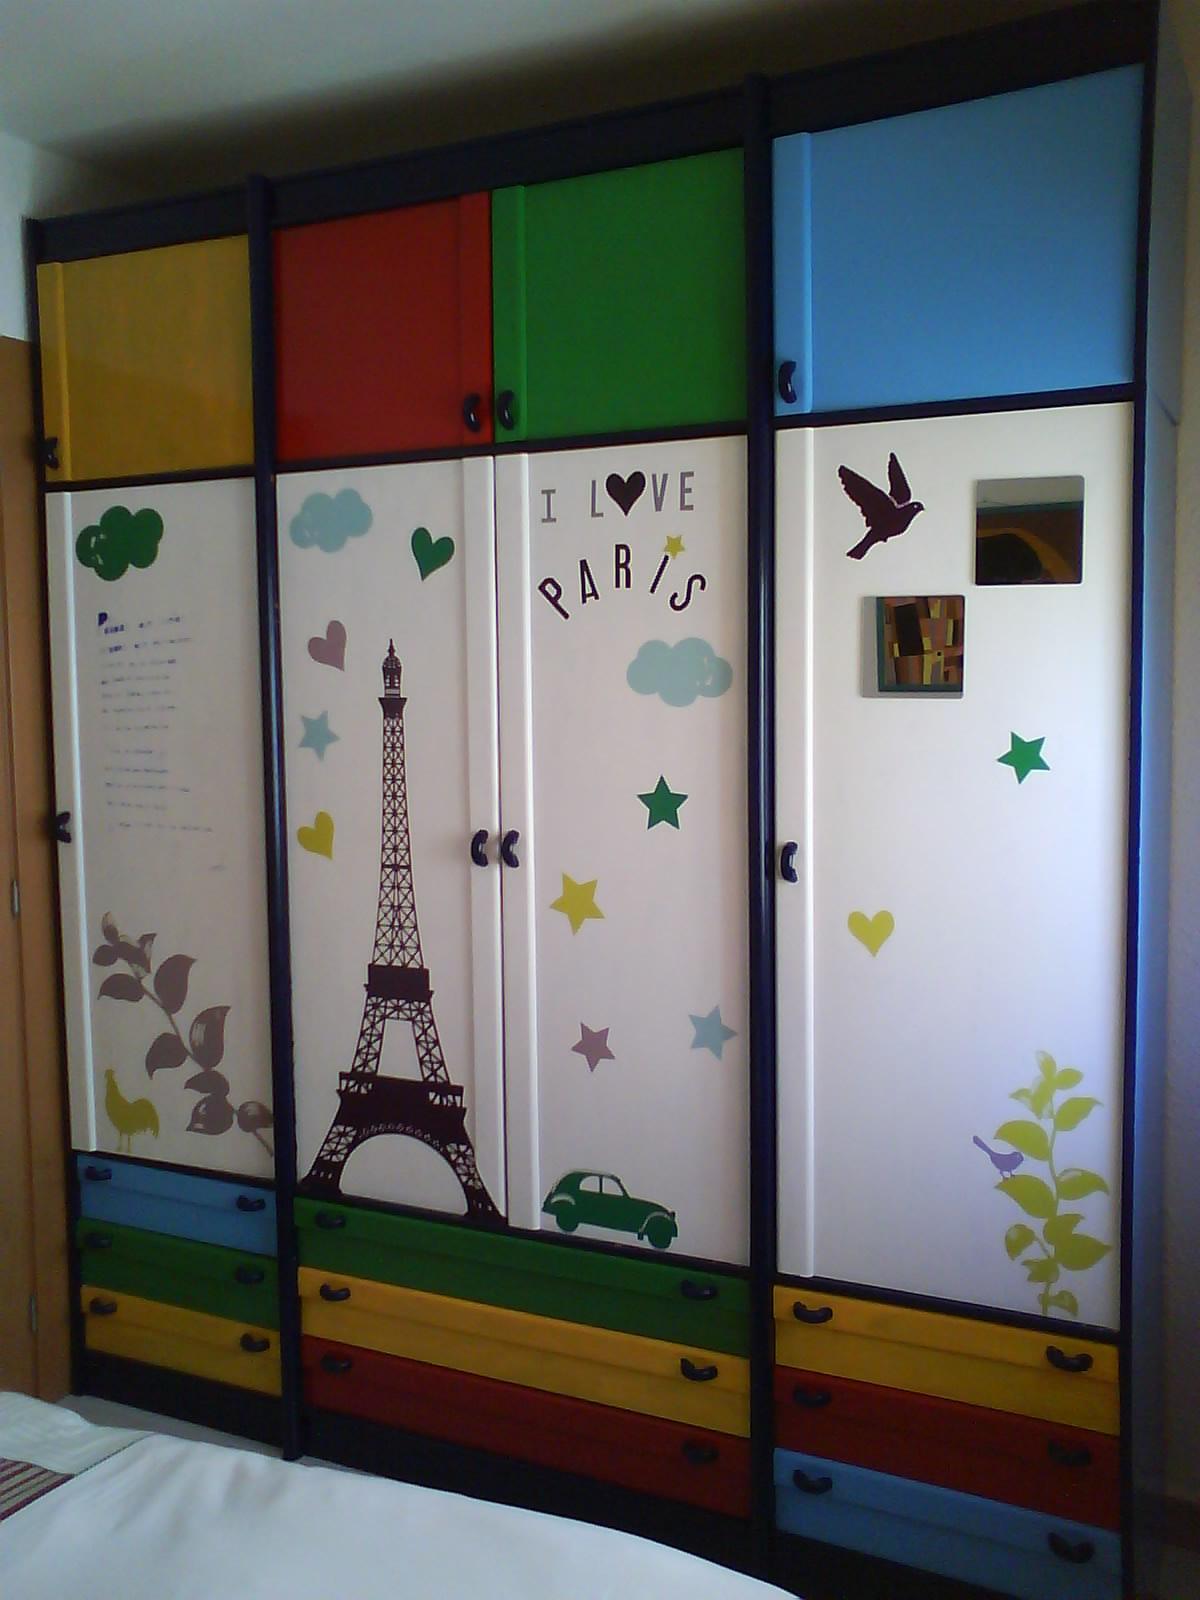 Hoy me he dado cuenta armario restaurado for Aplicacion para disenar armarios